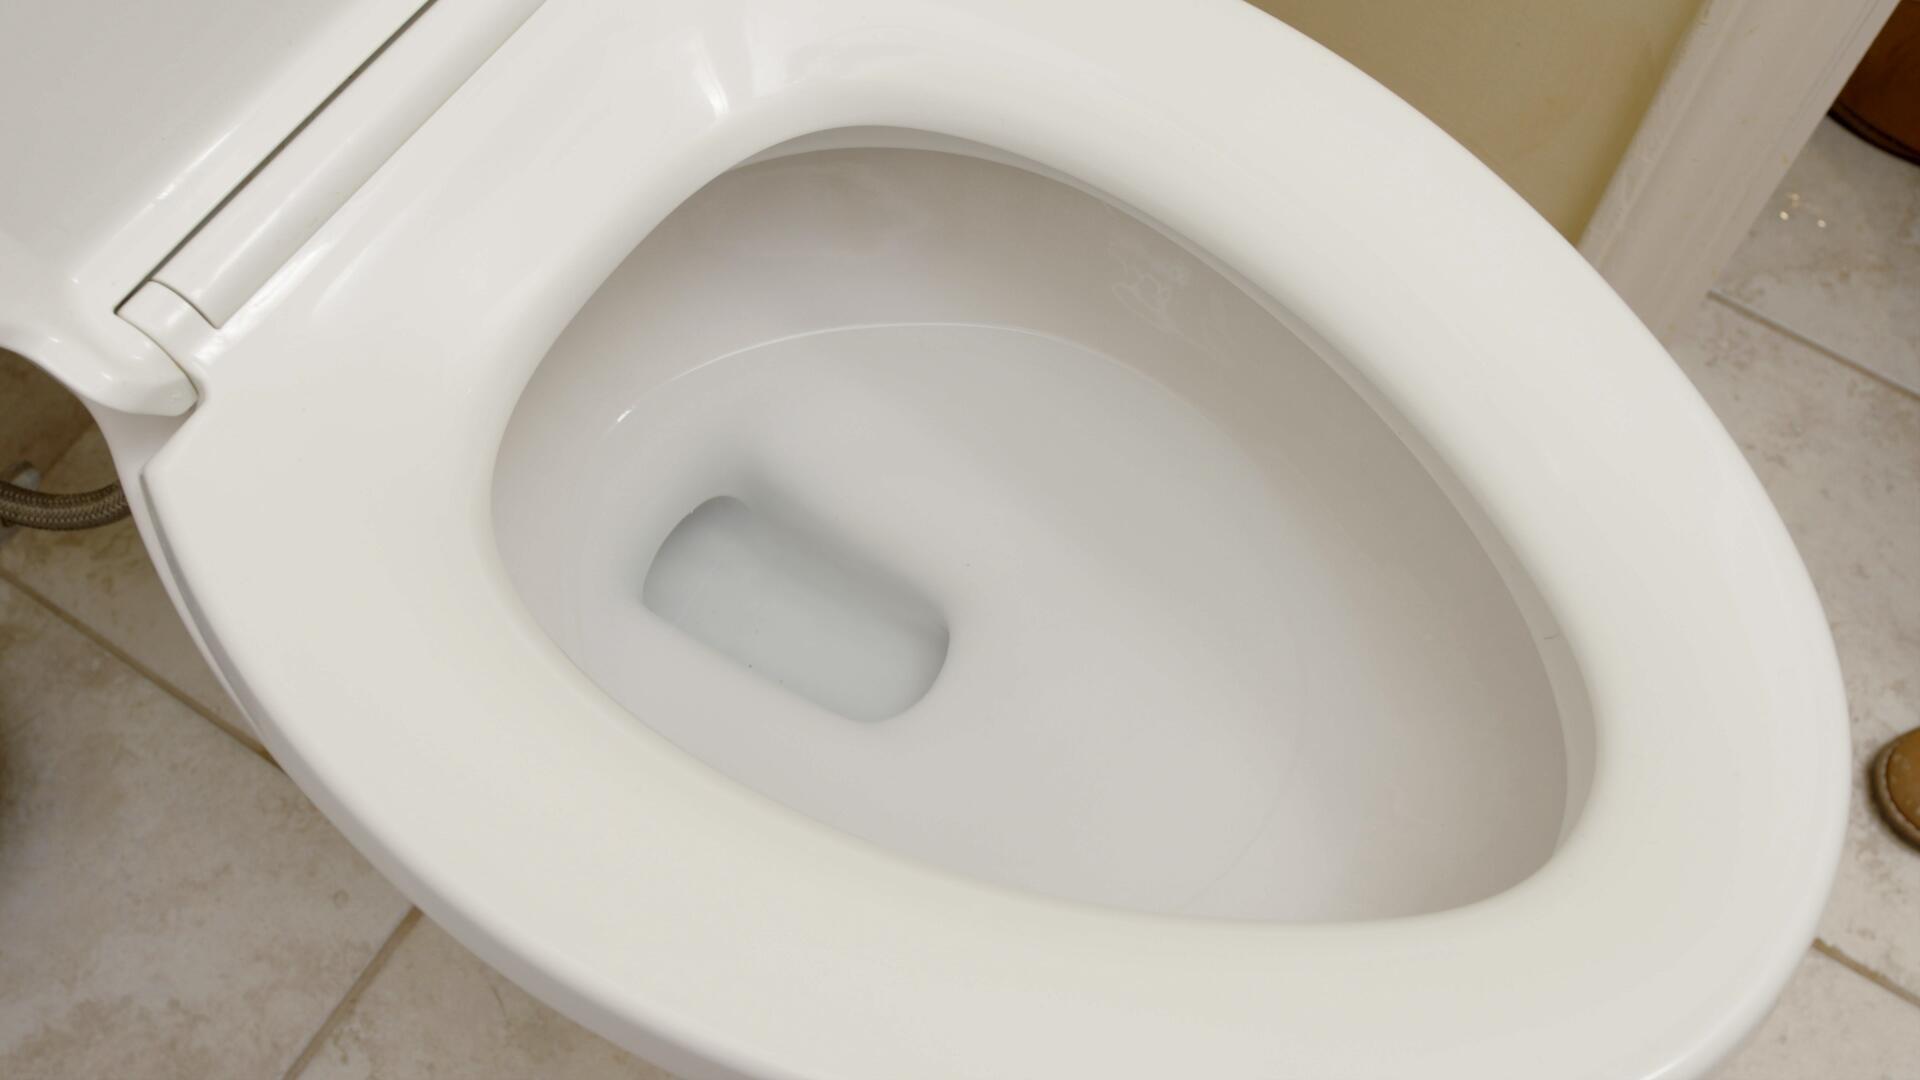 Toilet-Use-As-Normal.f1cb27a519bdb5b6ed34049a5b86e317.jpg